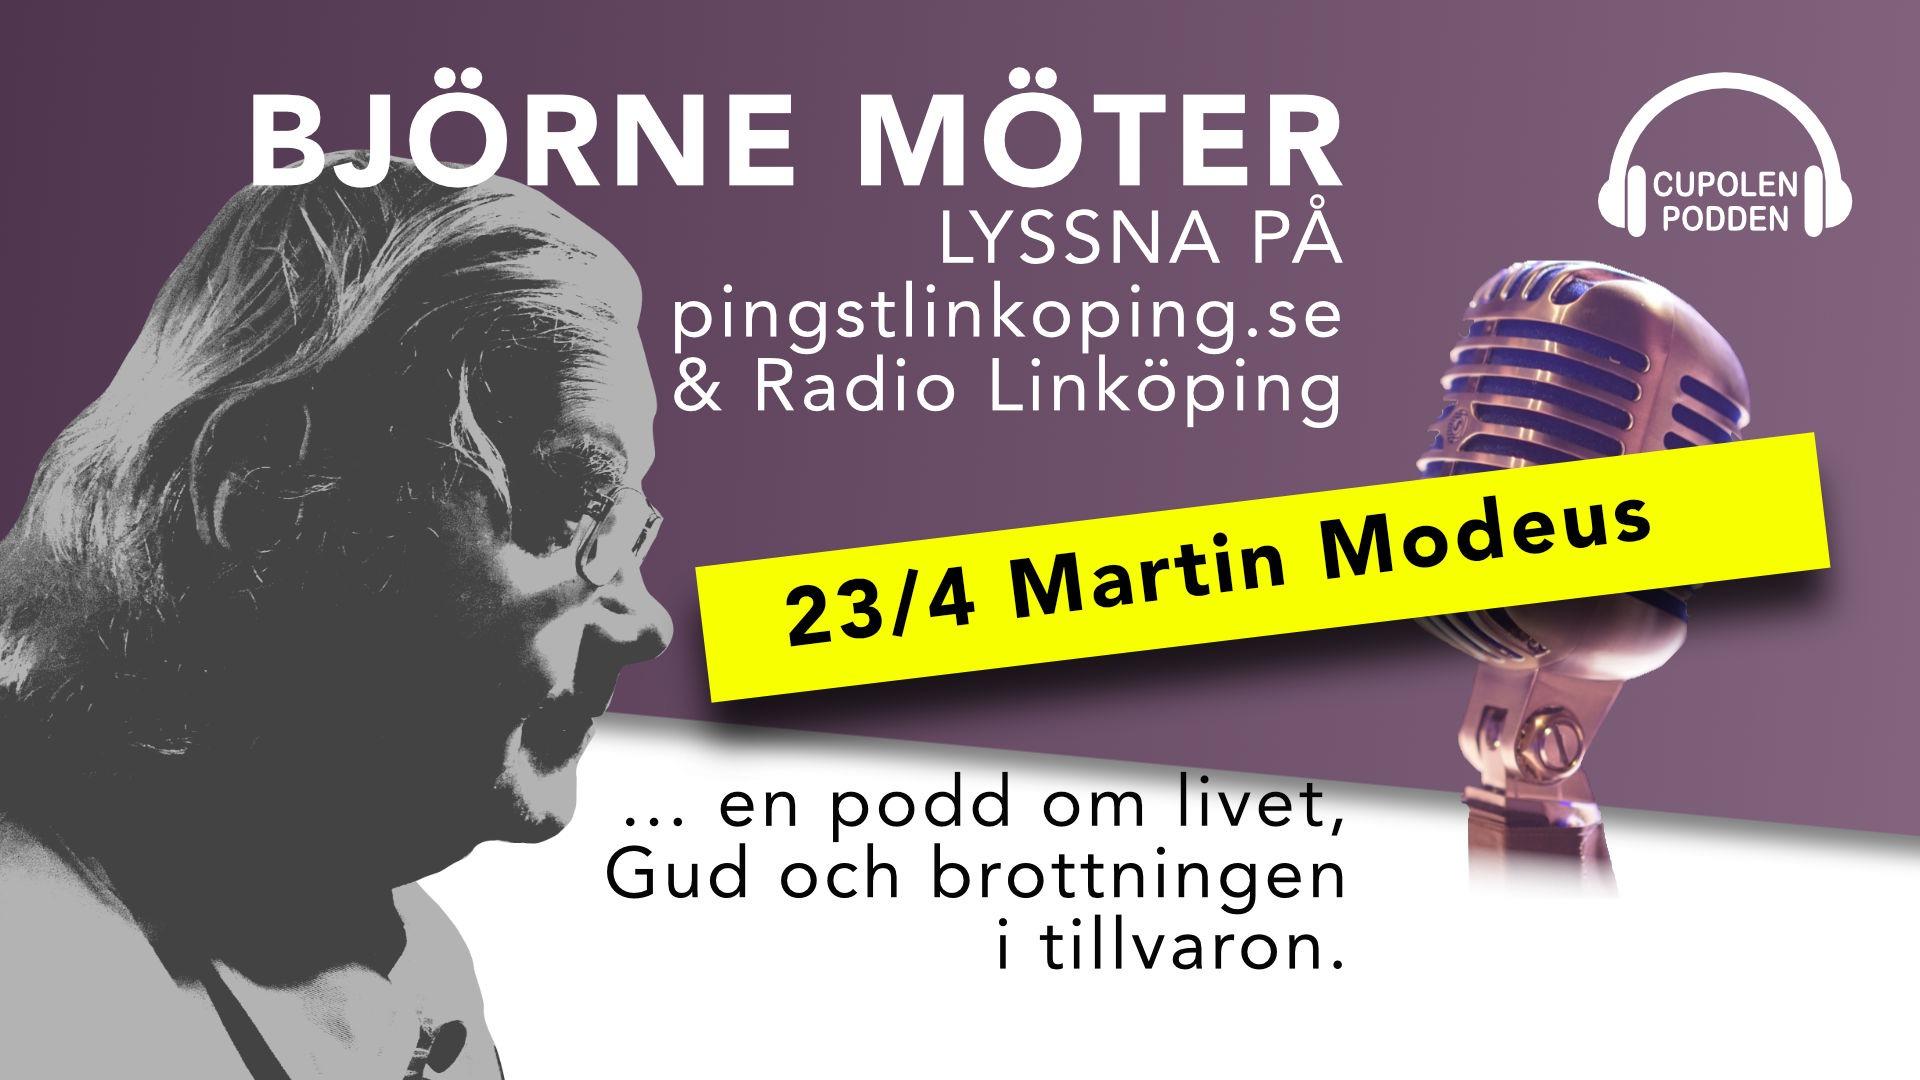 Björne möter Martin Modeus 23 april